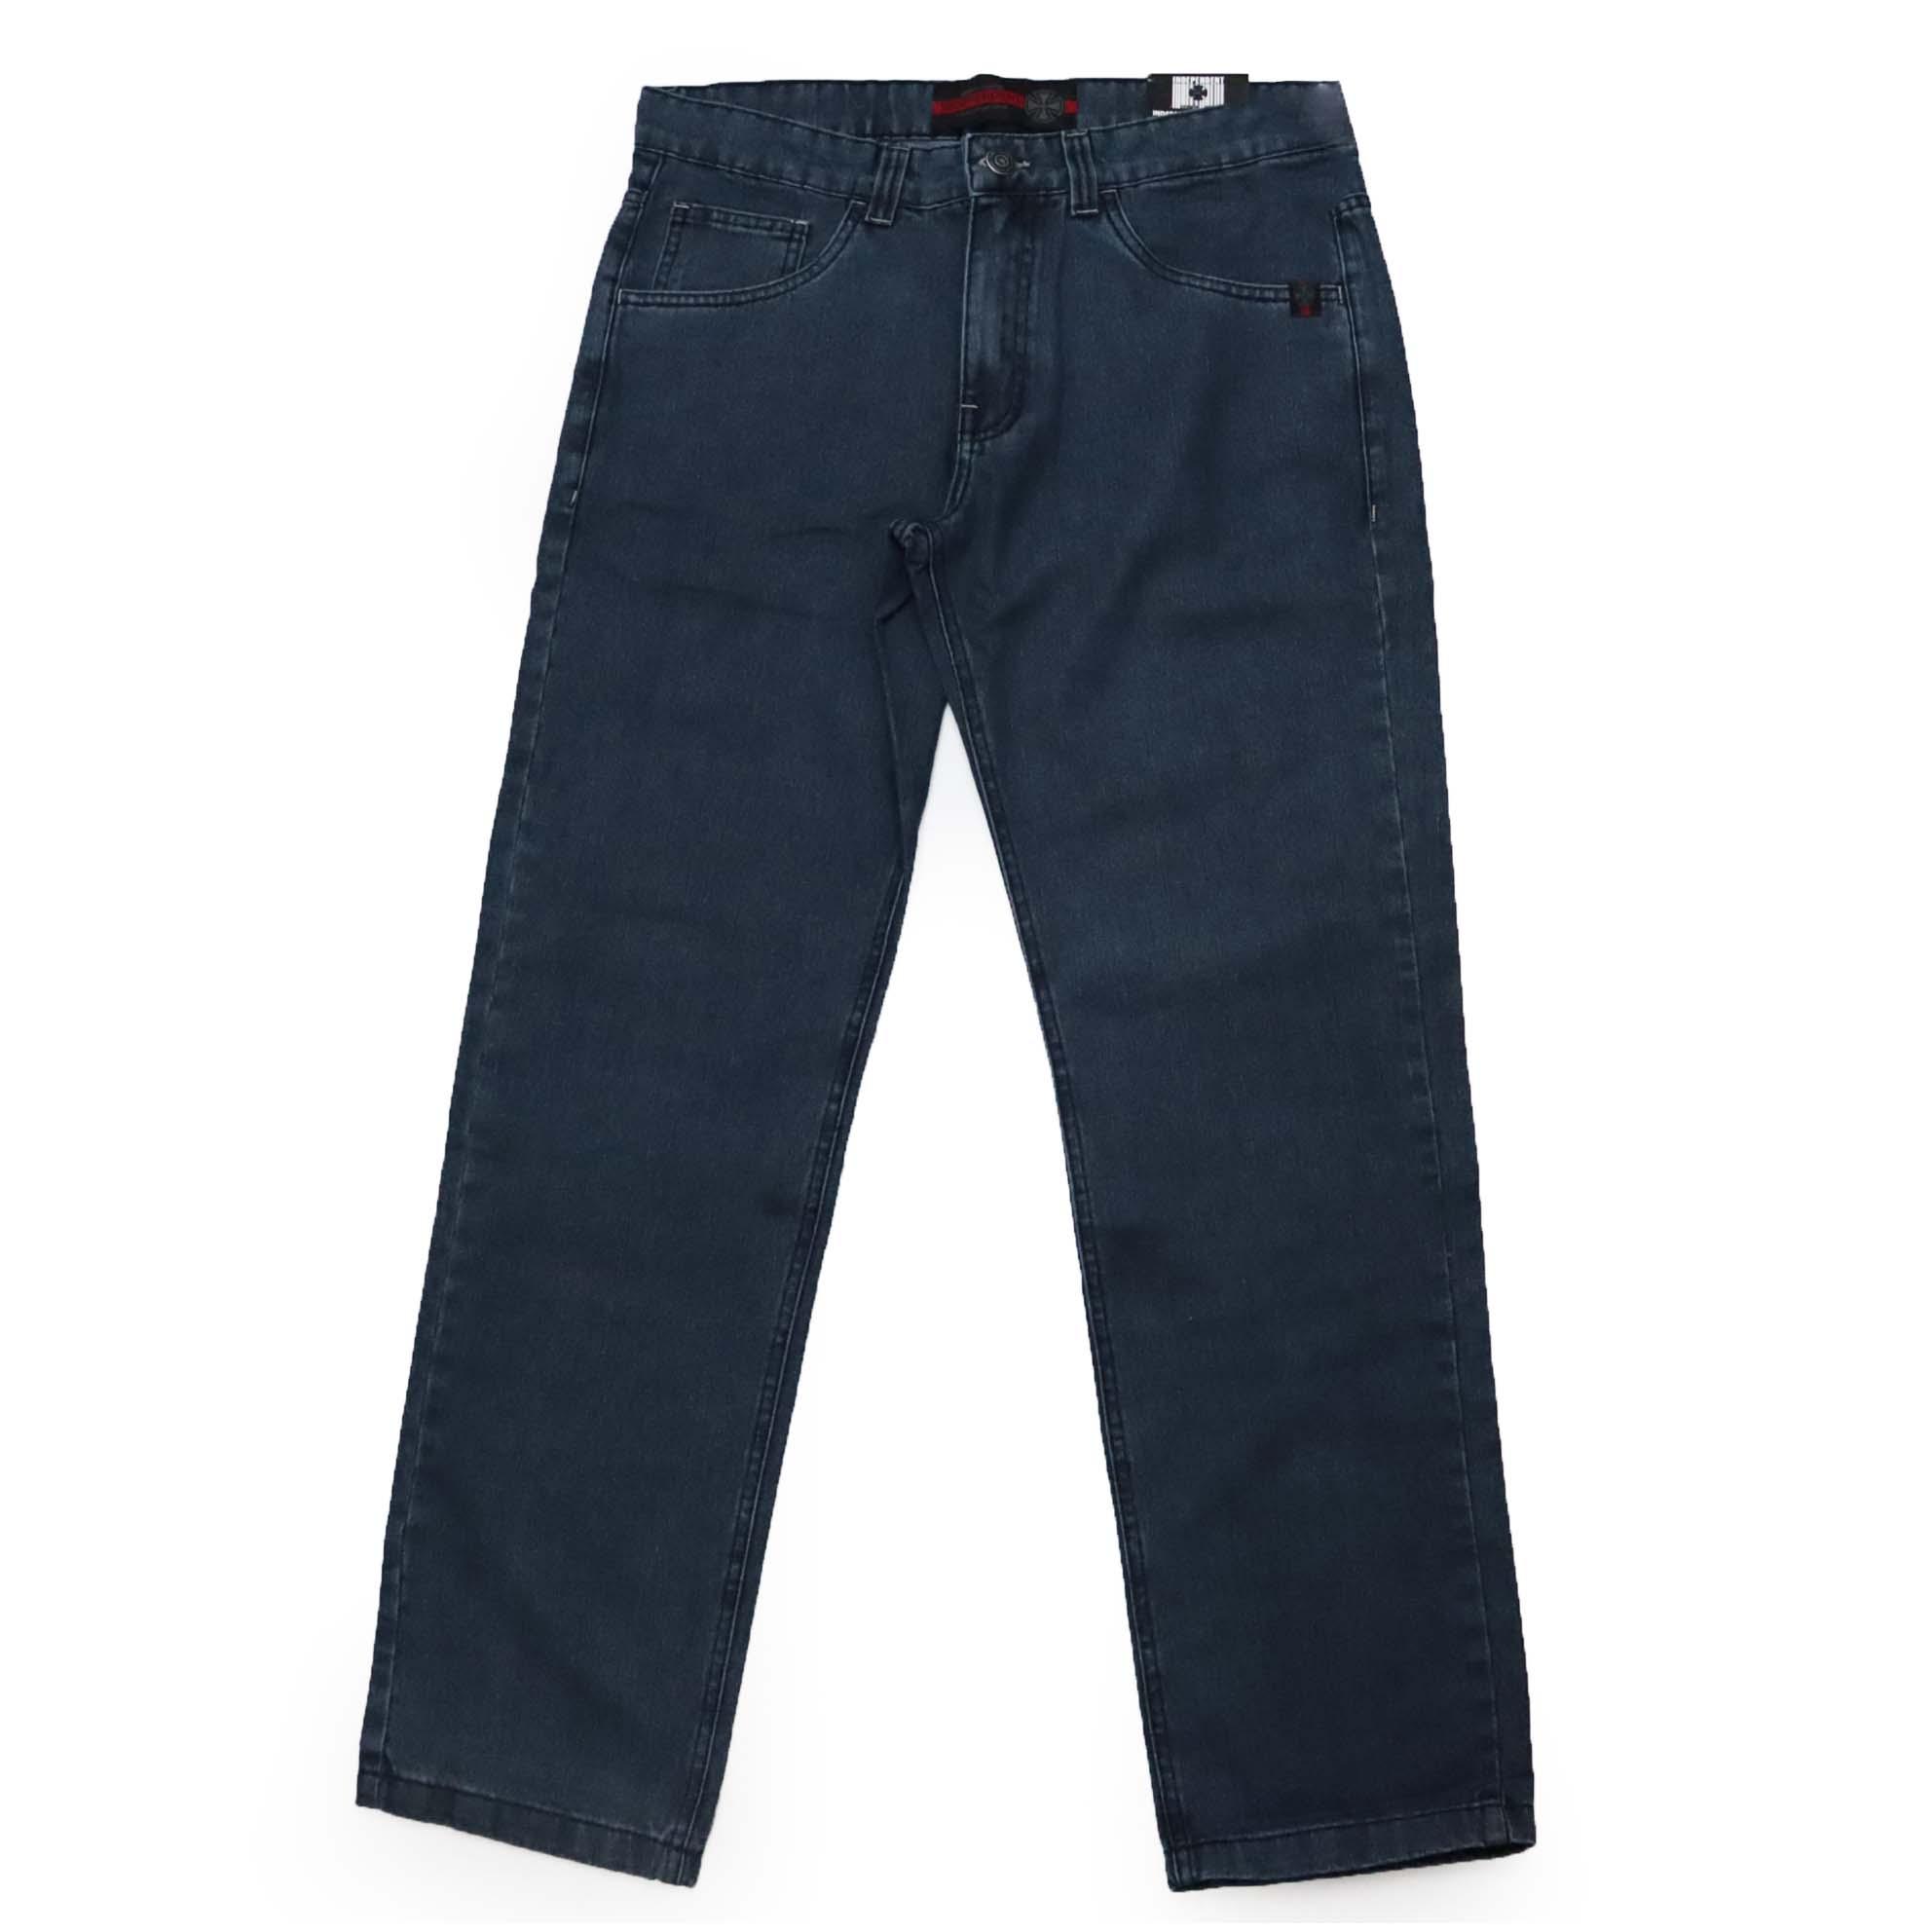 Calça Jeans Independent Tier Cross Denin - Azul Escuro